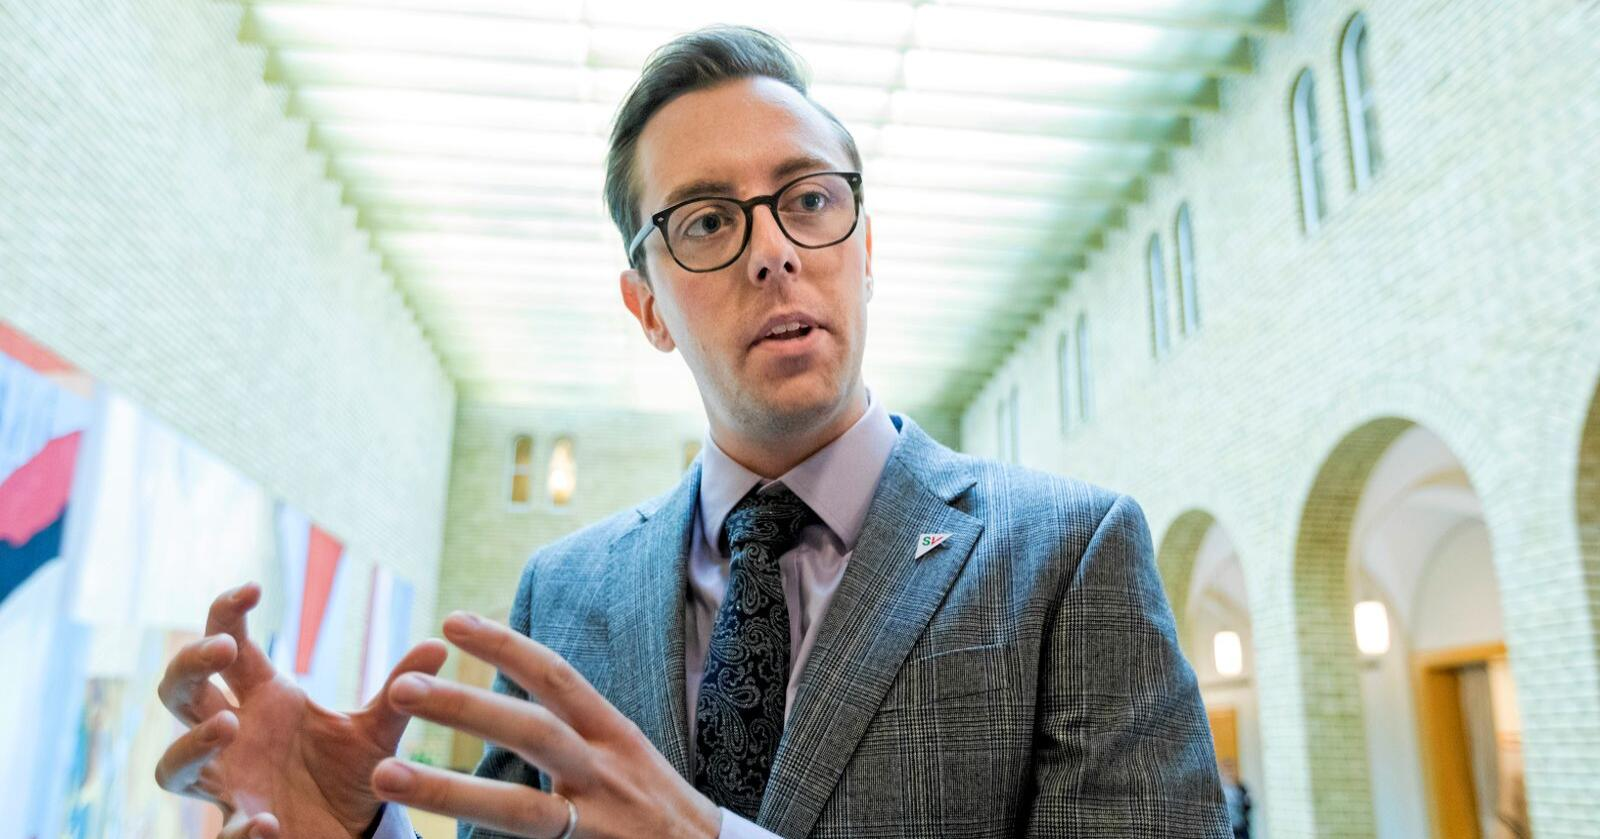 Nicholas Wilkinson er Stortingsrepresentant for Sosialistisk Venstreparti. Foto: Gorm Kallestad / NTB scanpix